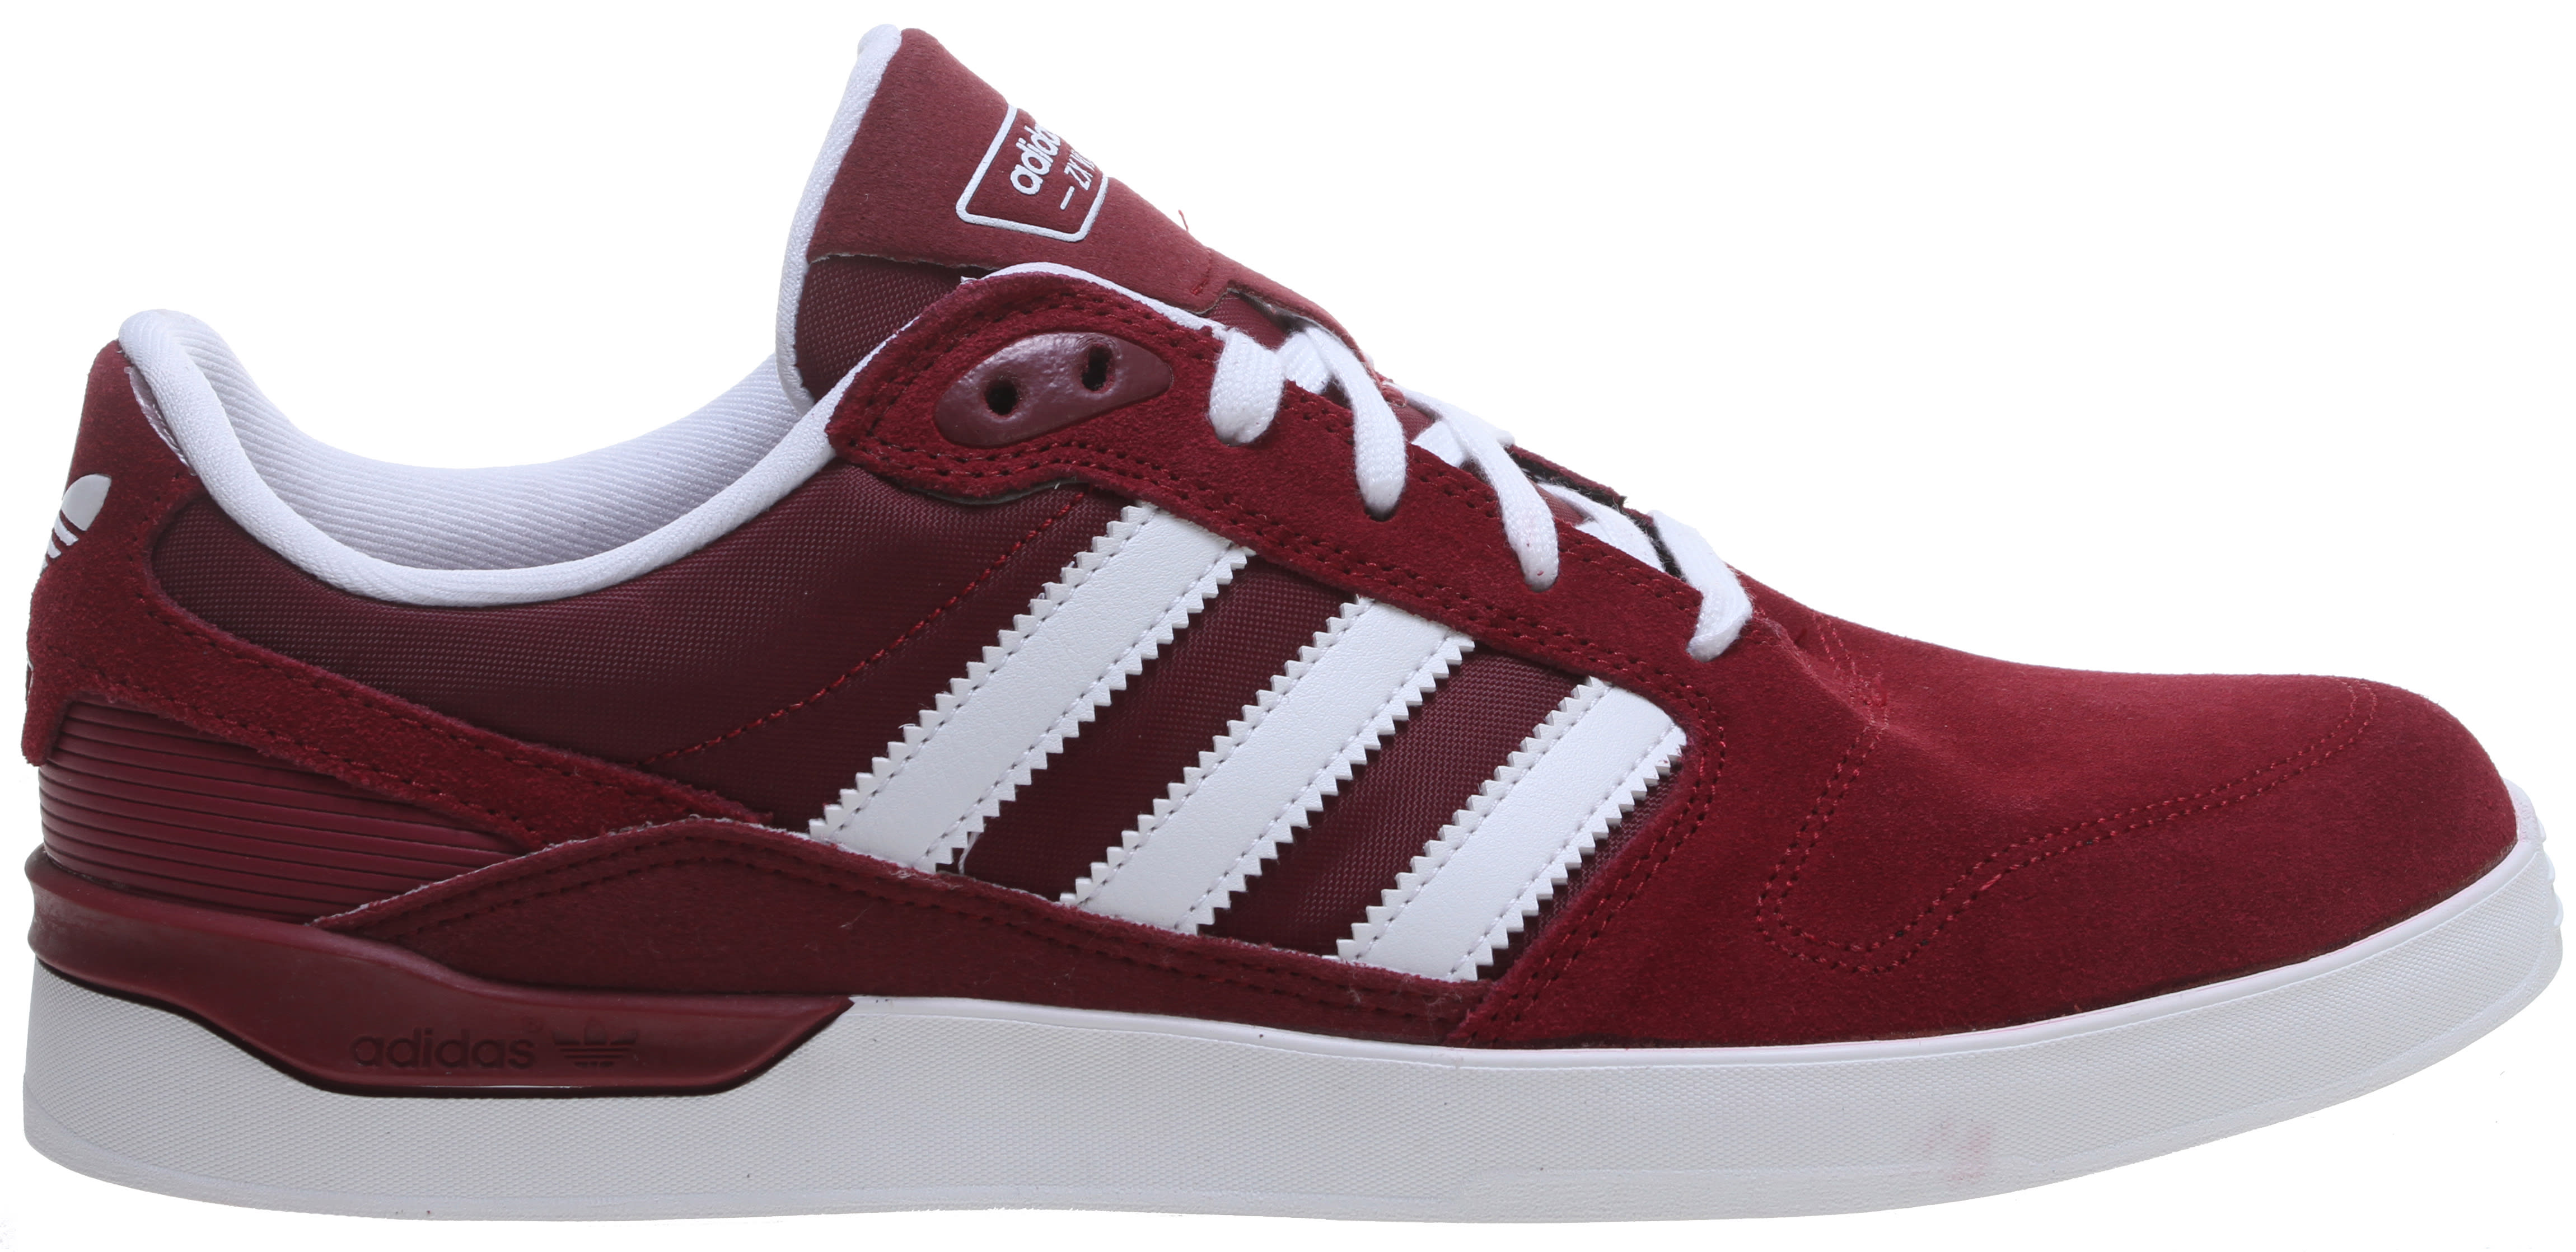 Skate shoes under 30 dollars - Adidas Skate Shoes